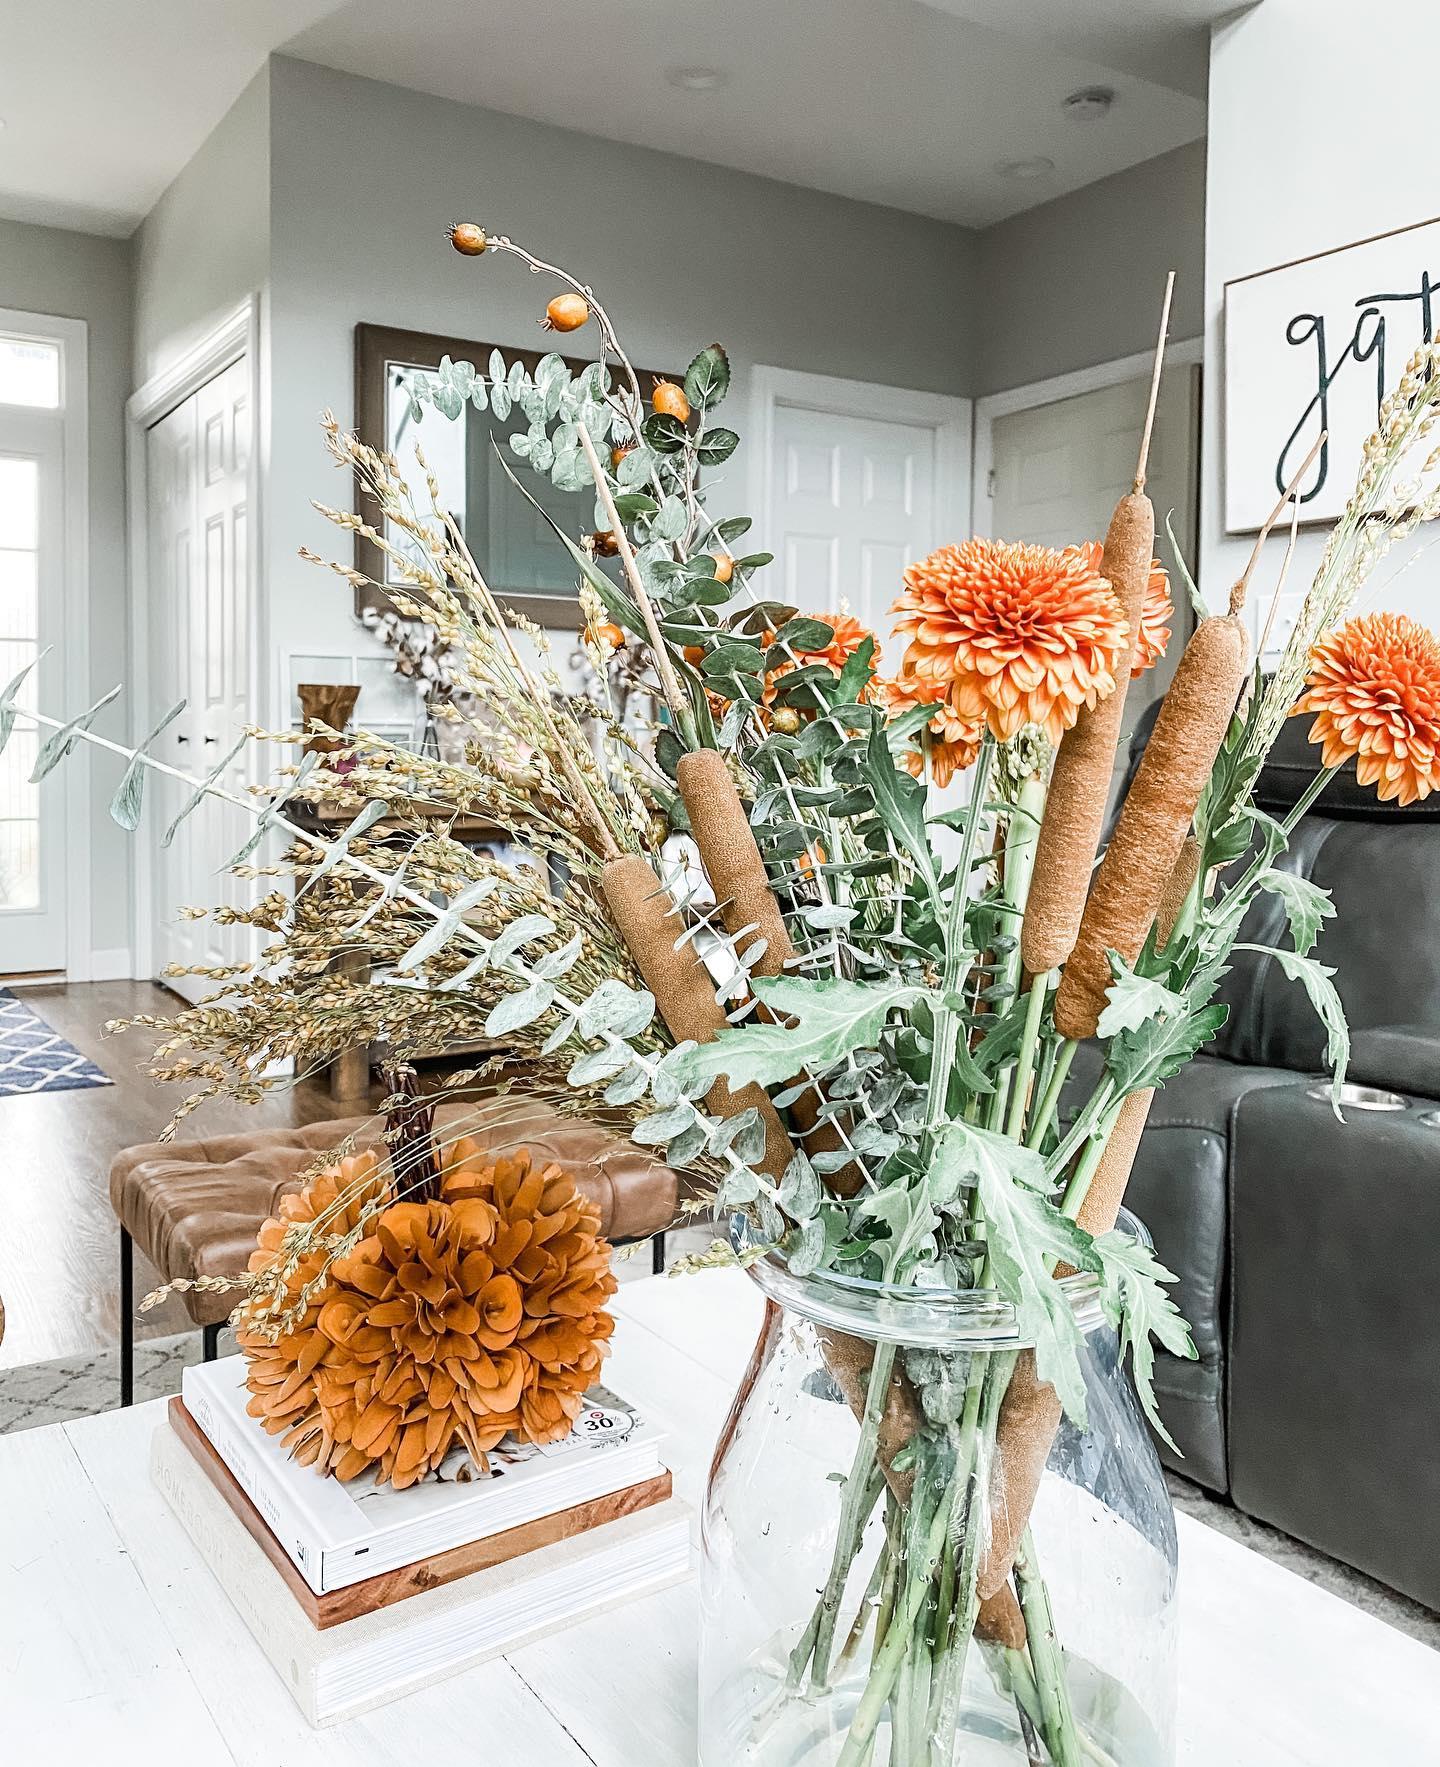 Bottom Dollar Design interior decoration of flowers